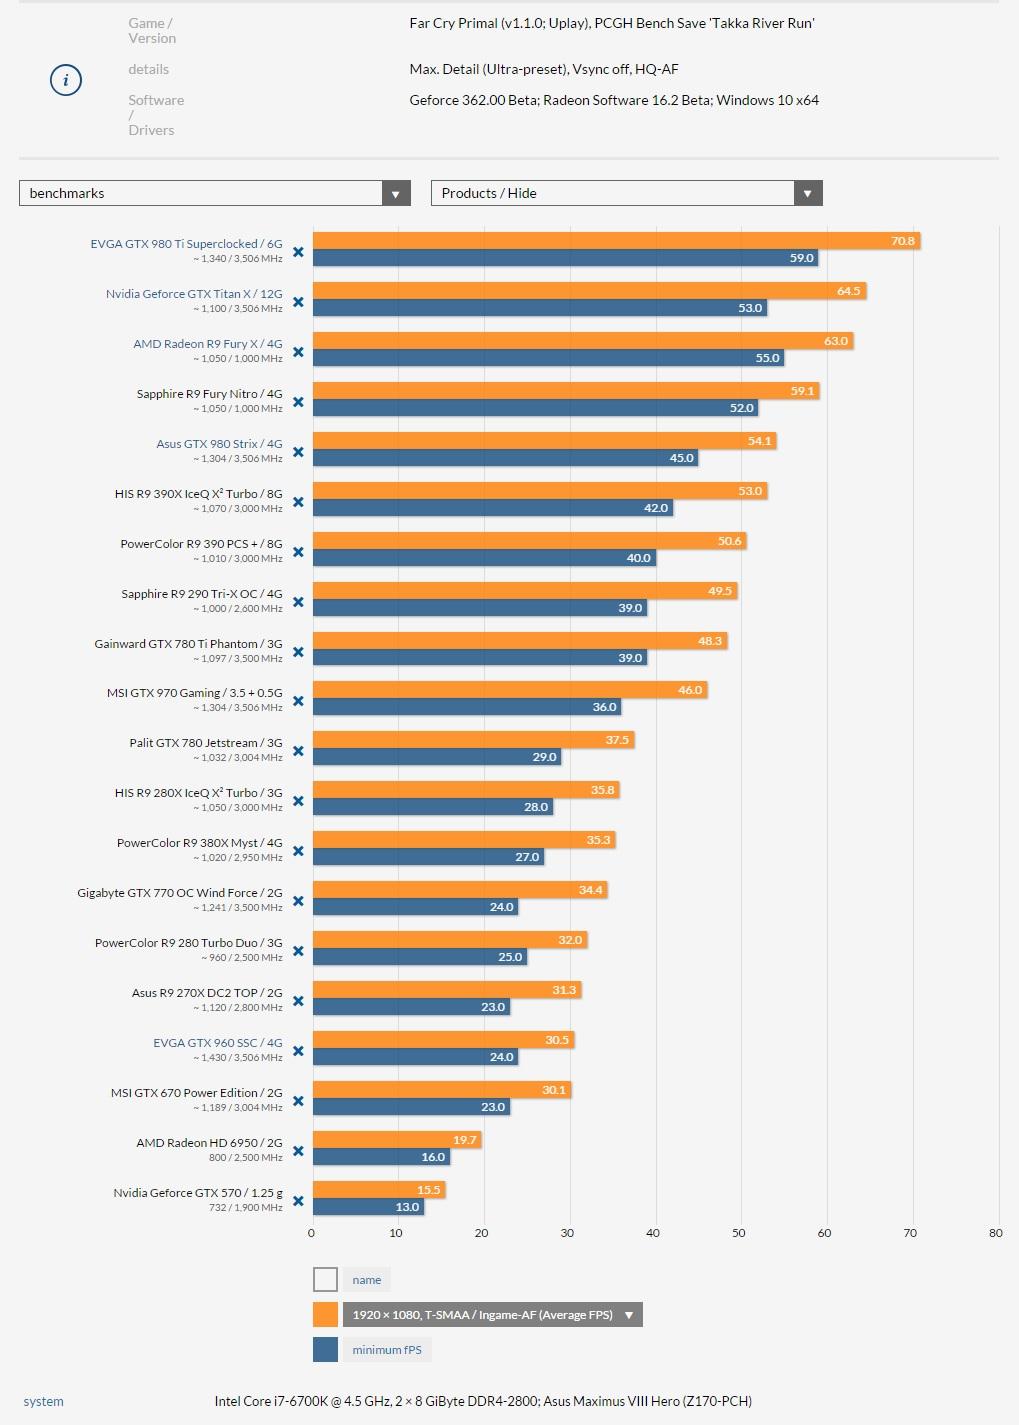 nvidia-amd-far-cry-primal-pc-benchmarks-1080p-pcgameshardware